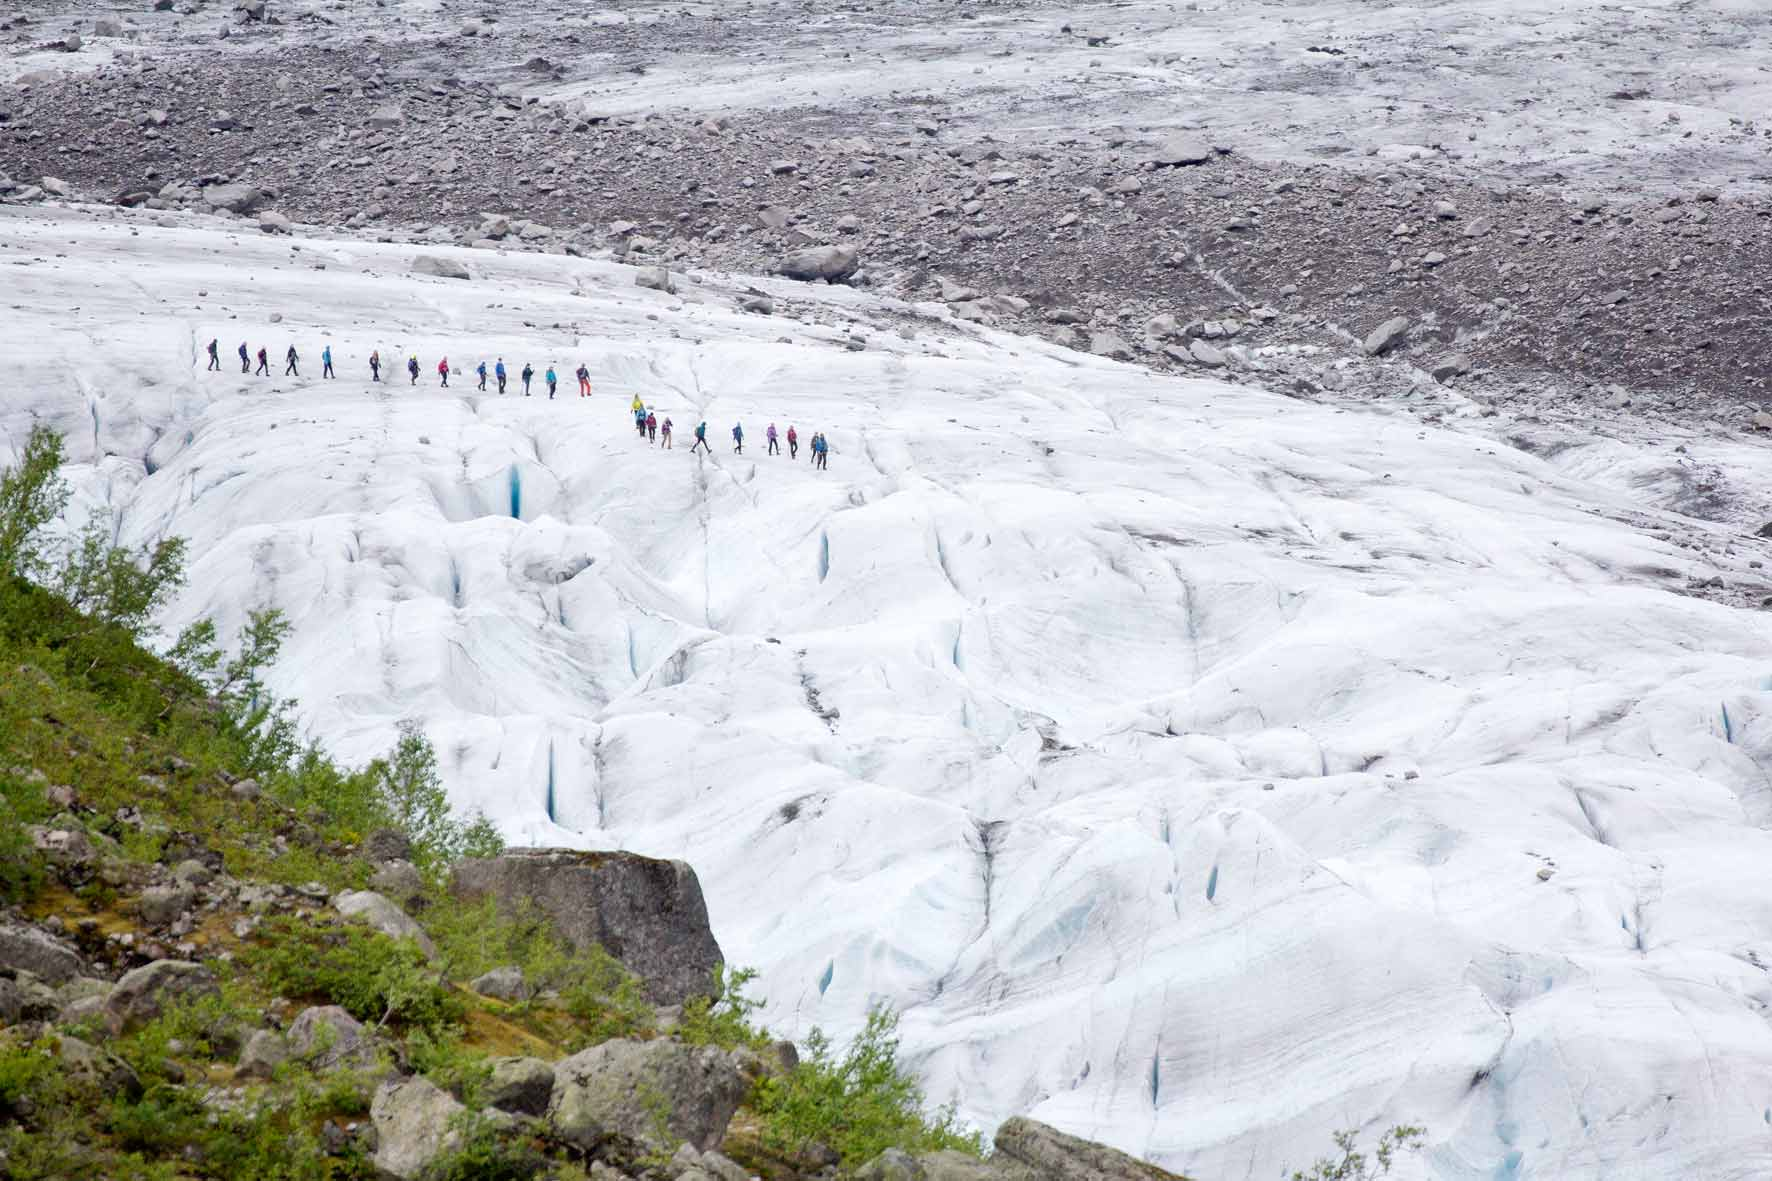 Gletscherwanderung Austerdalsbreen